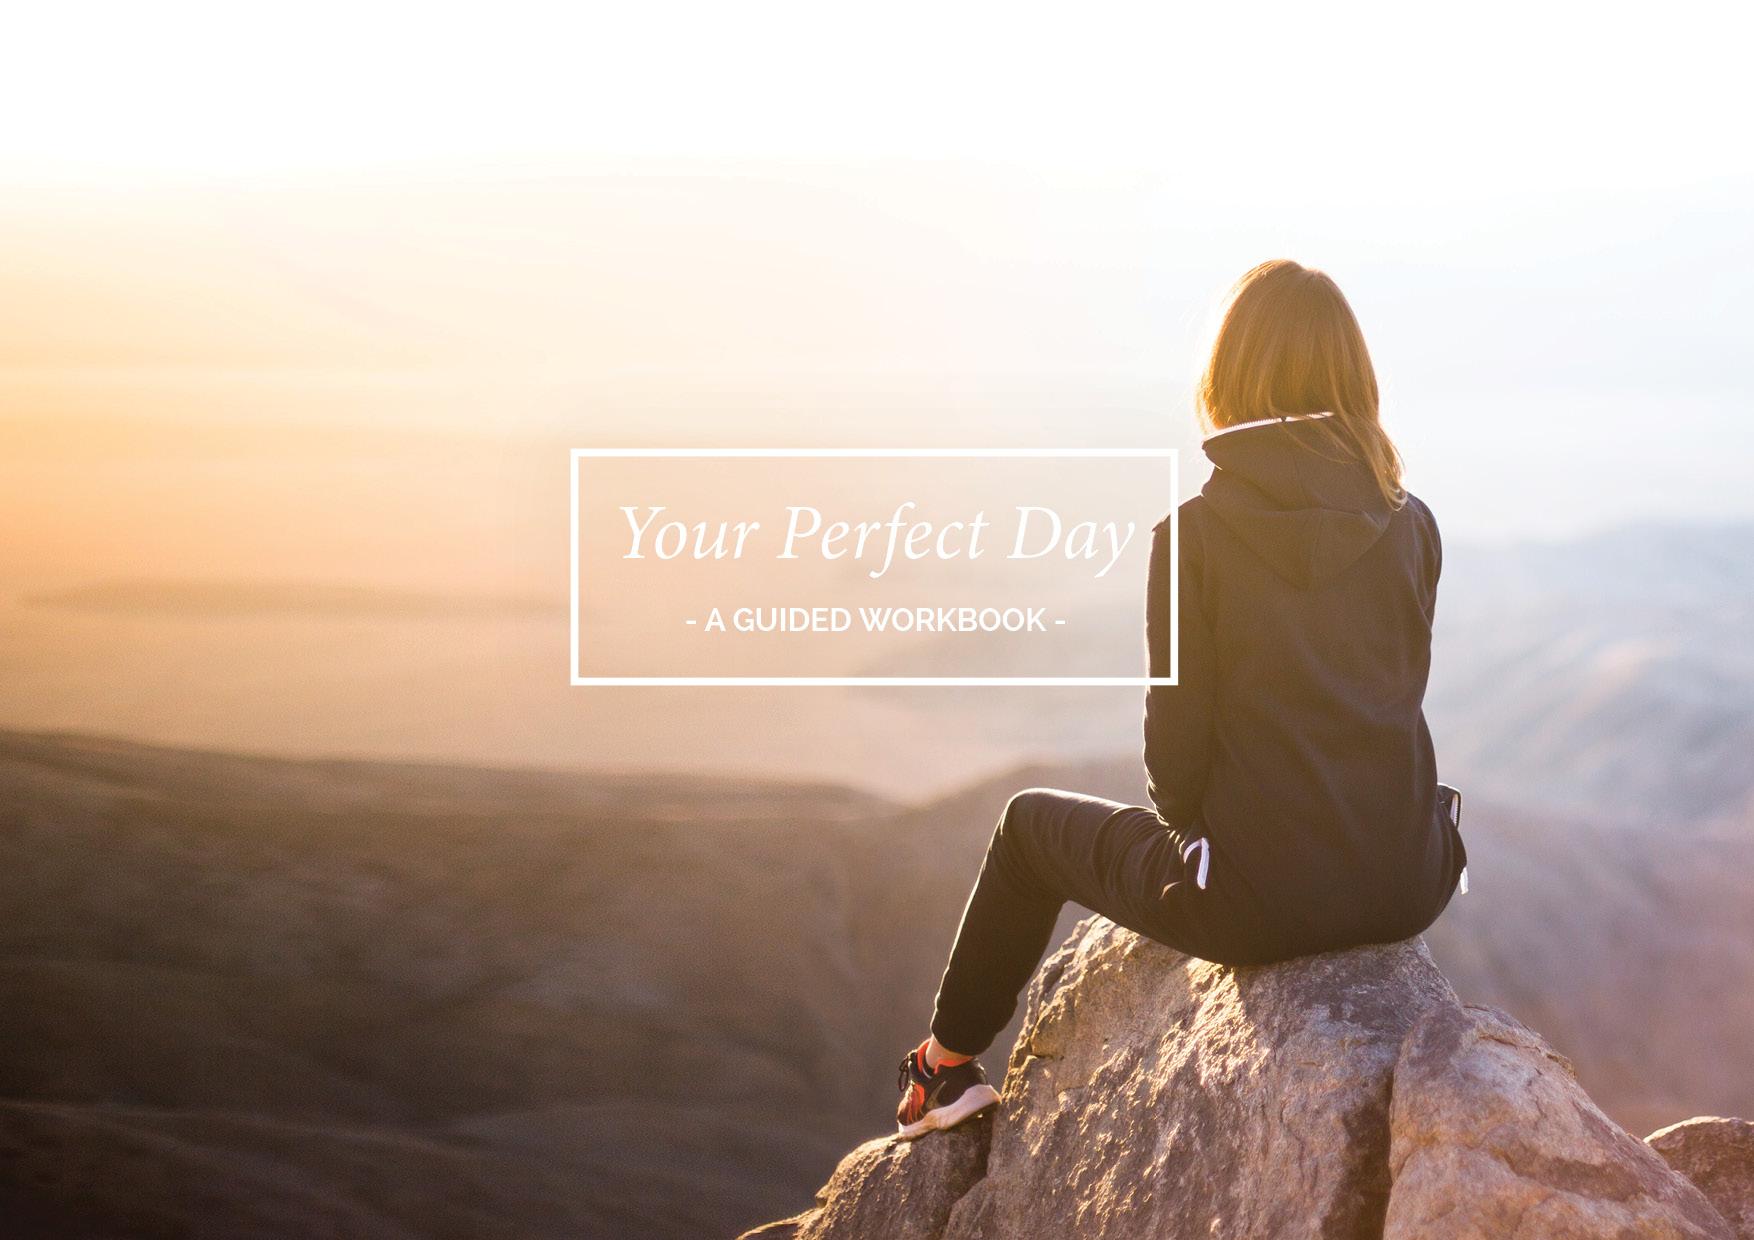 PerfectDay eBook Cover.jpg